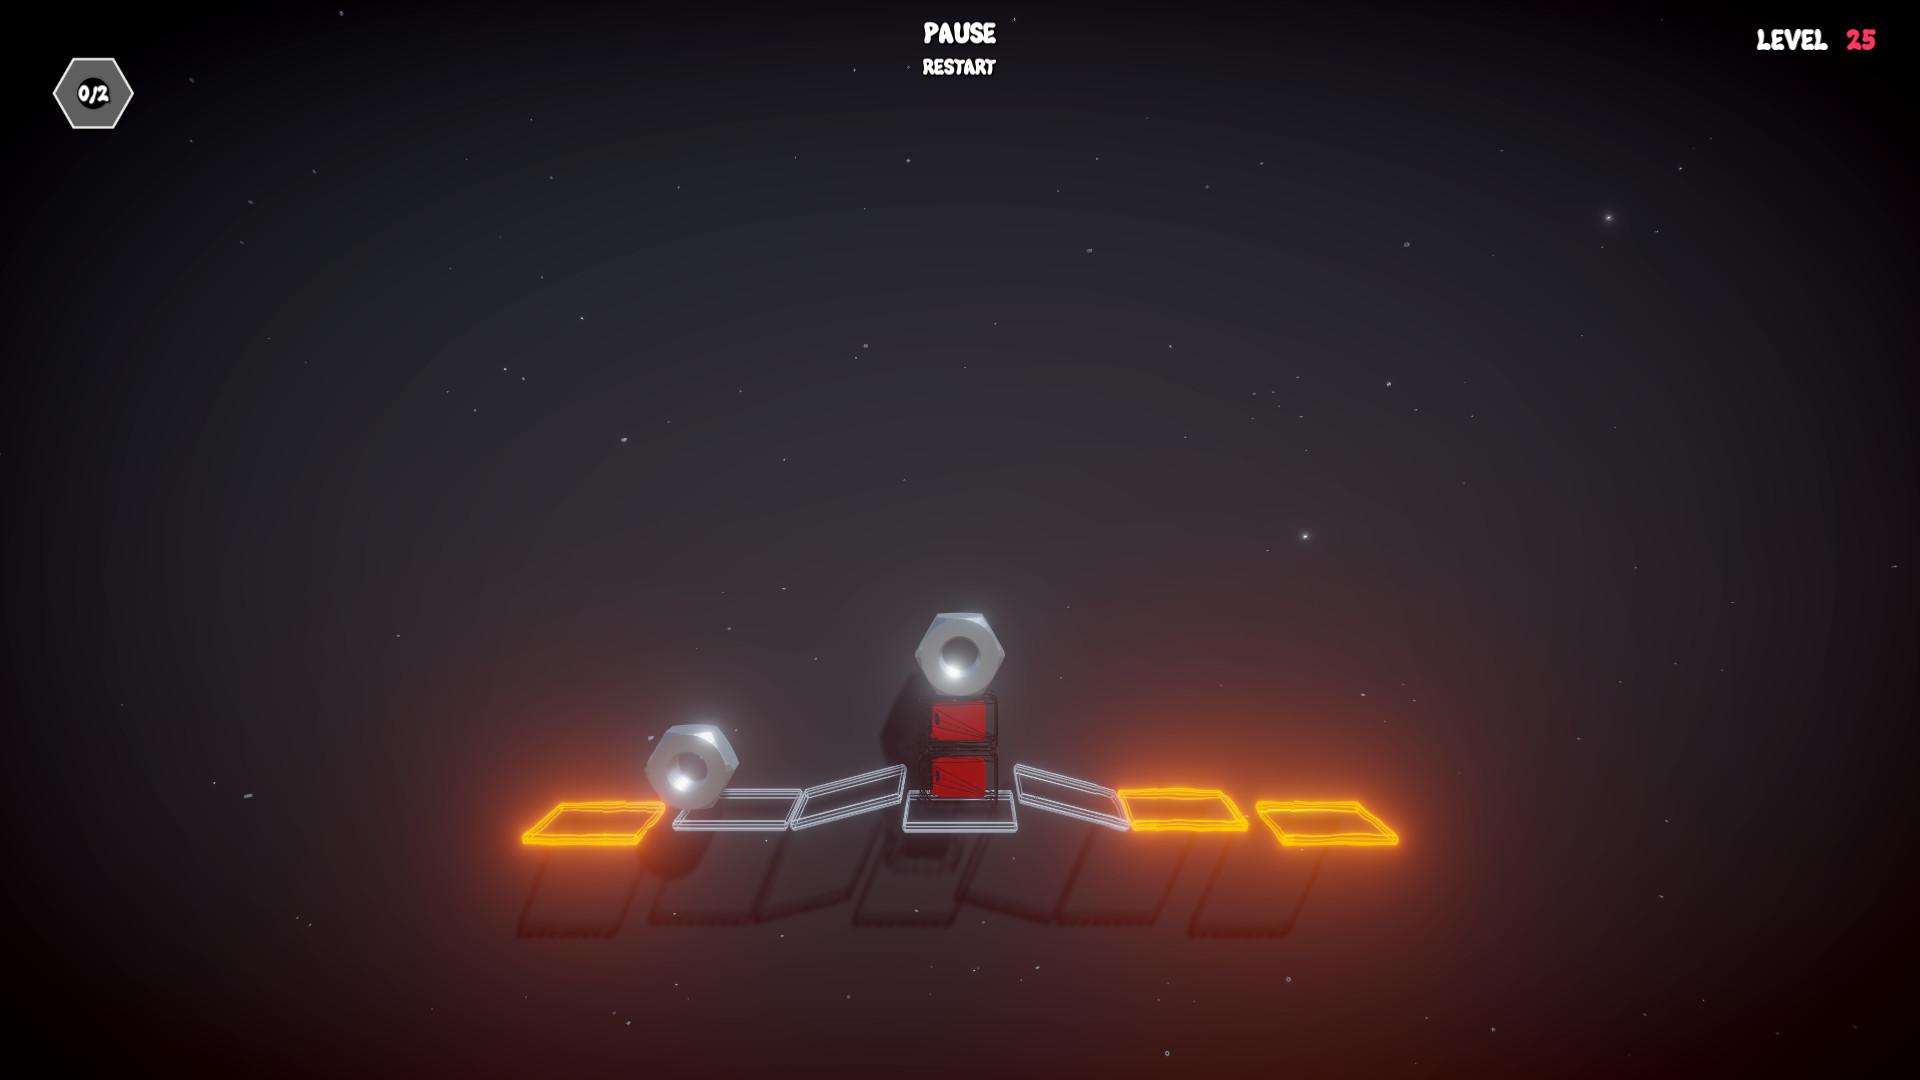 SCREW-NUT screenshot